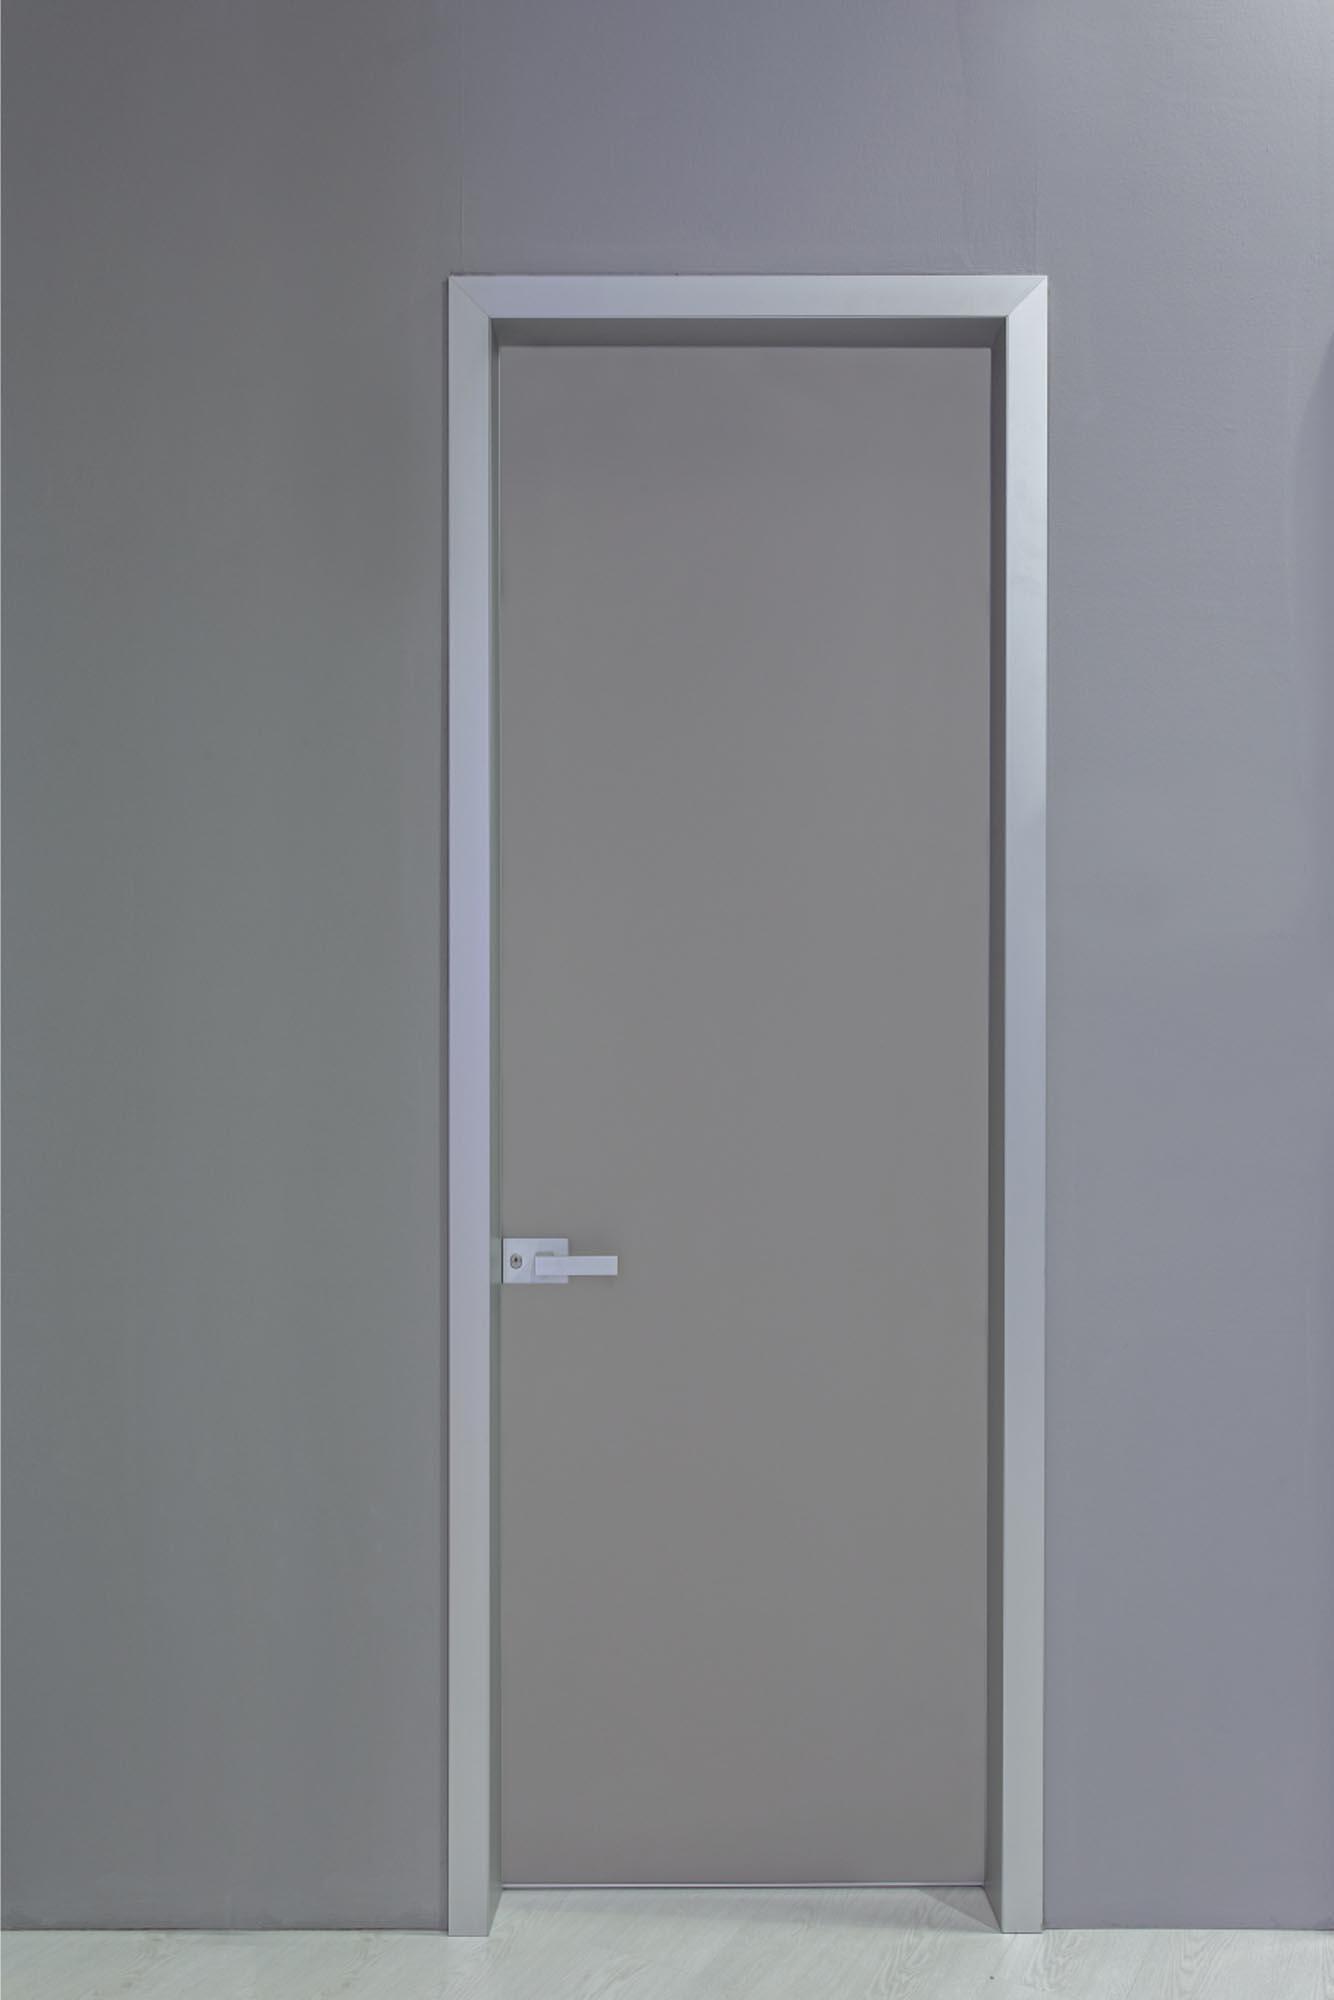 INTERNAL DOOR MINIMAL WITH ALUMINUM FRAME & SATINATO GLASS